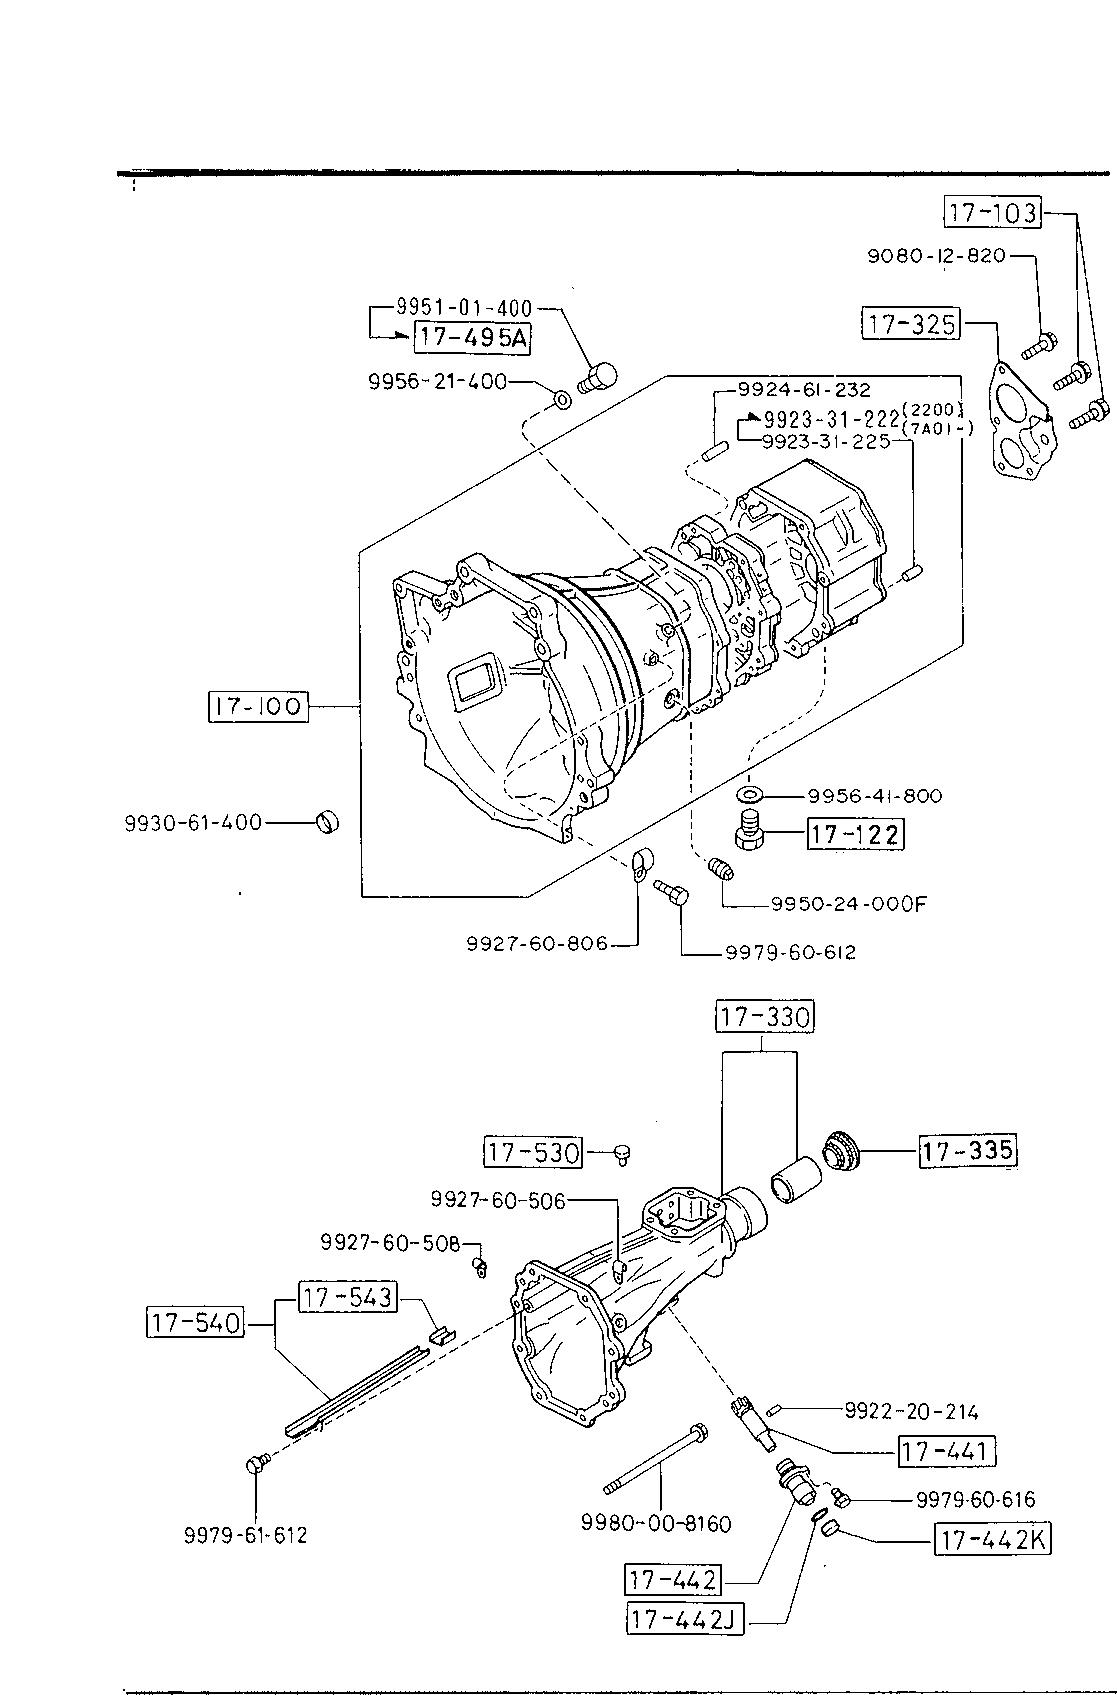 USA, 1986 B2000, GASOLINE-ENGINE & TRANSMISSION, 1700 A